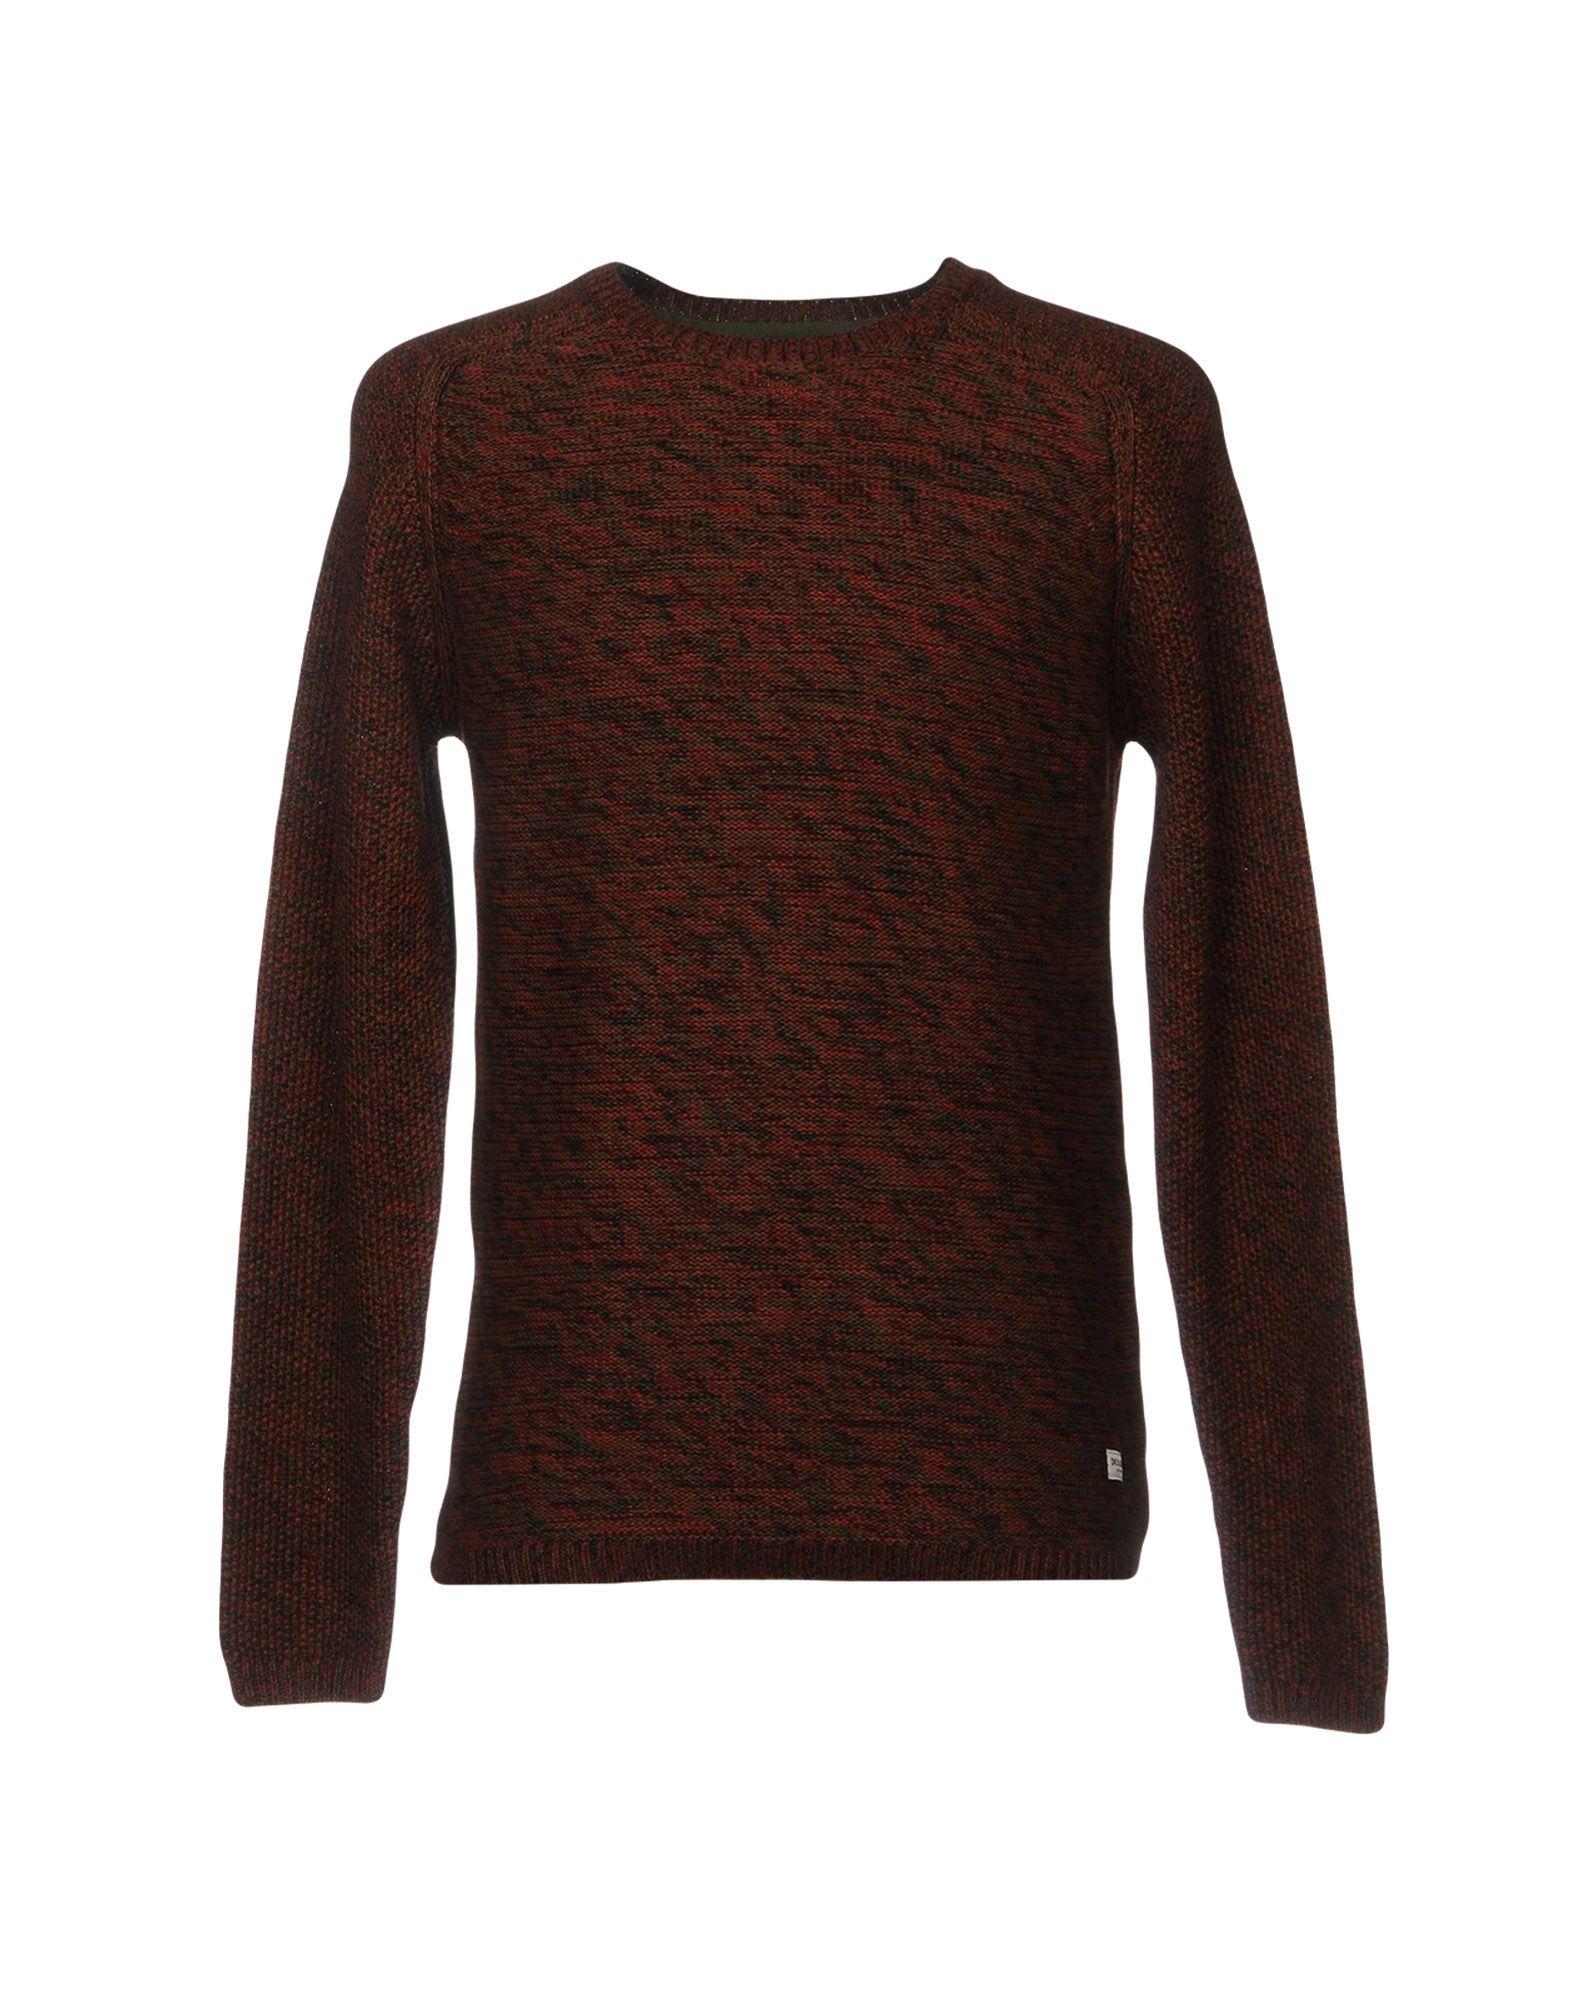 ФОТО only & sons свитер